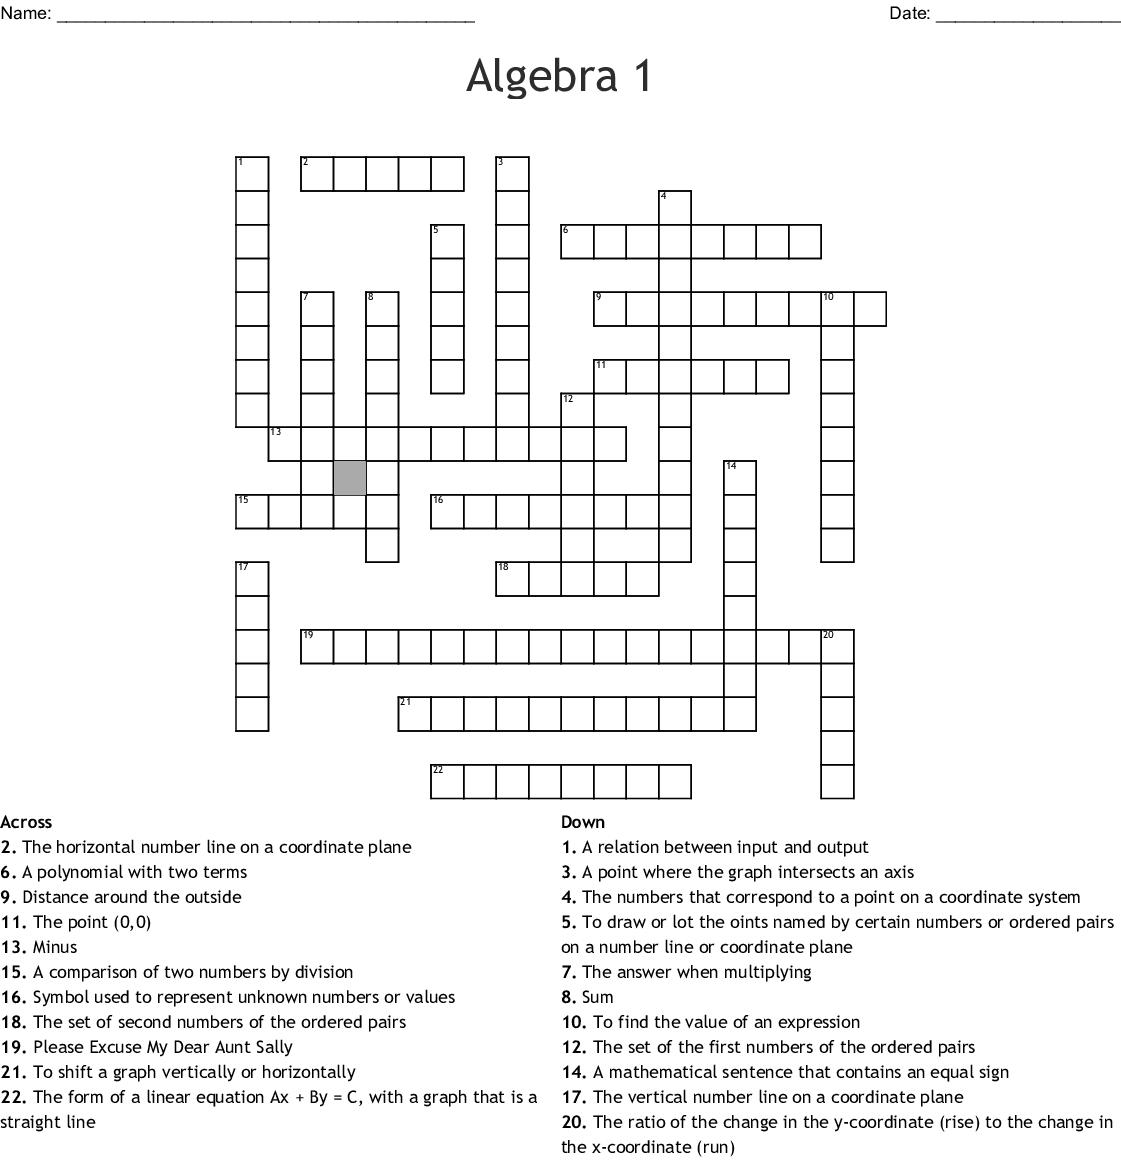 Algebra 1 Crossword - Wordmint - Free Printable Crossword Puzzle #1 Answers